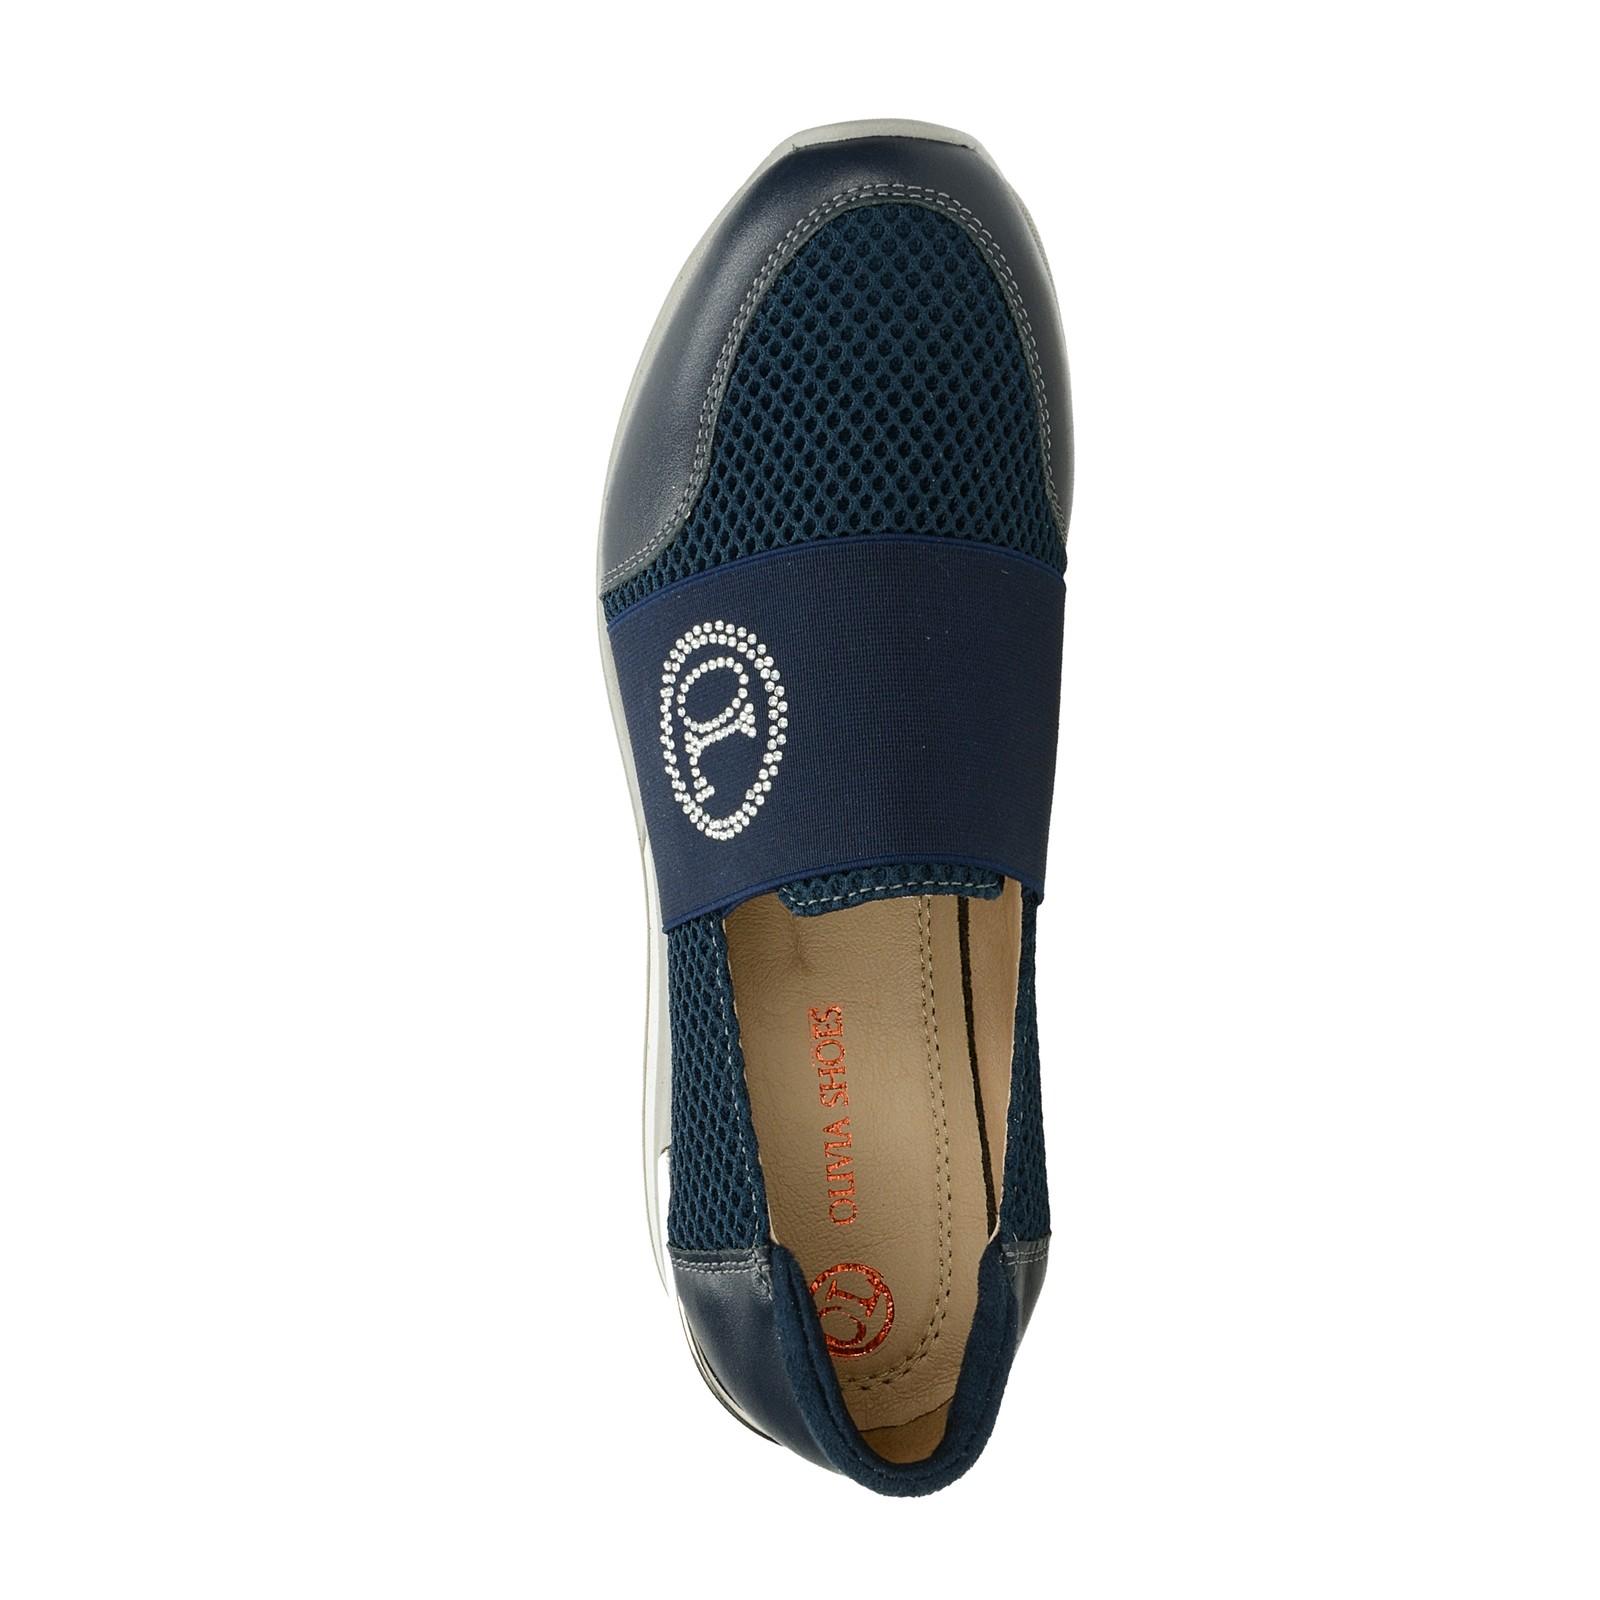 d6279c9e3 Olivia shoes dámské kožené stylové polobotky - tmavomodré | B801 ...